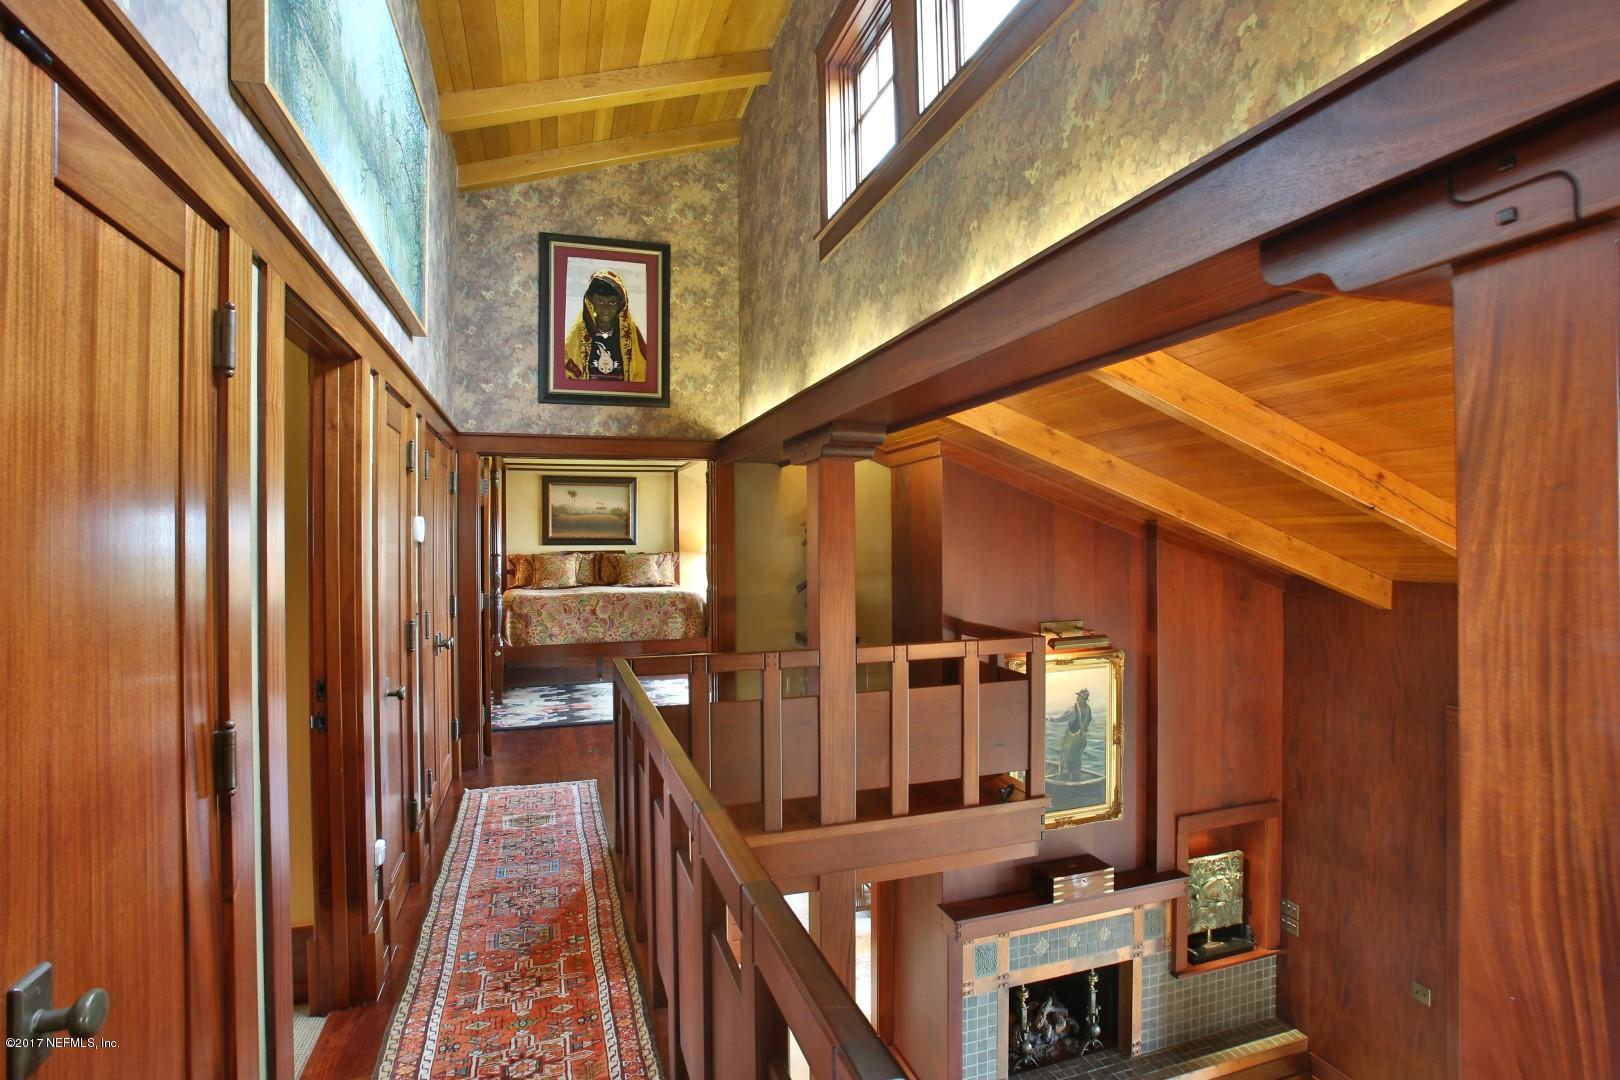 1507 ATLANTIC, NEW SMYRNA BEACH, FLORIDA 32169, 5 Bedrooms Bedrooms, ,4 BathroomsBathrooms,Residential - single family,For sale,ATLANTIC,868227